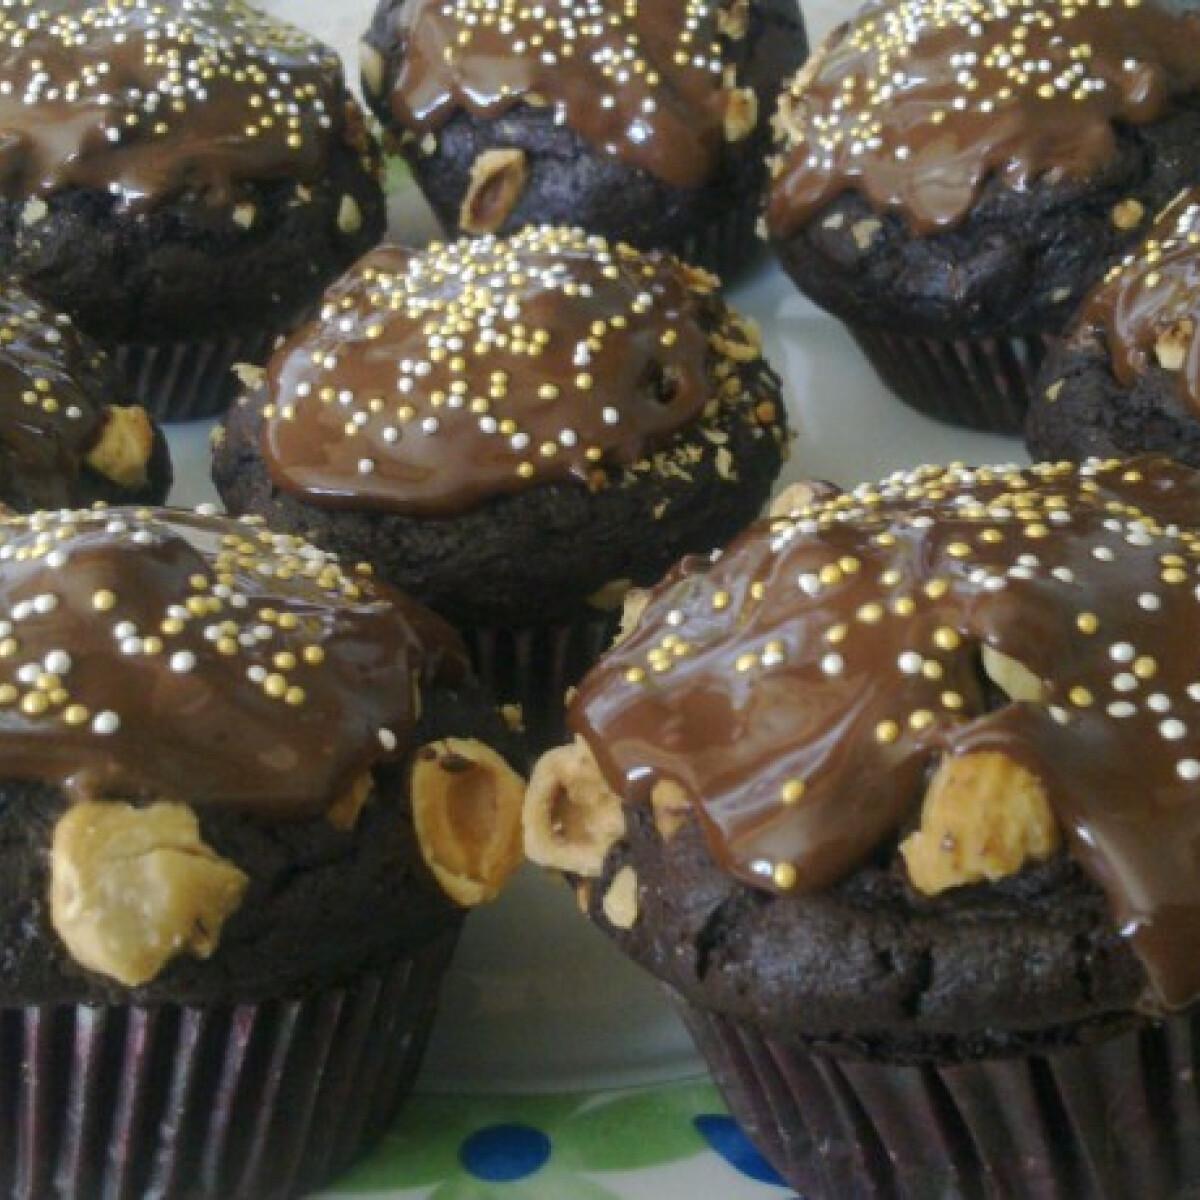 Csupa csokis muffin mogyoróval